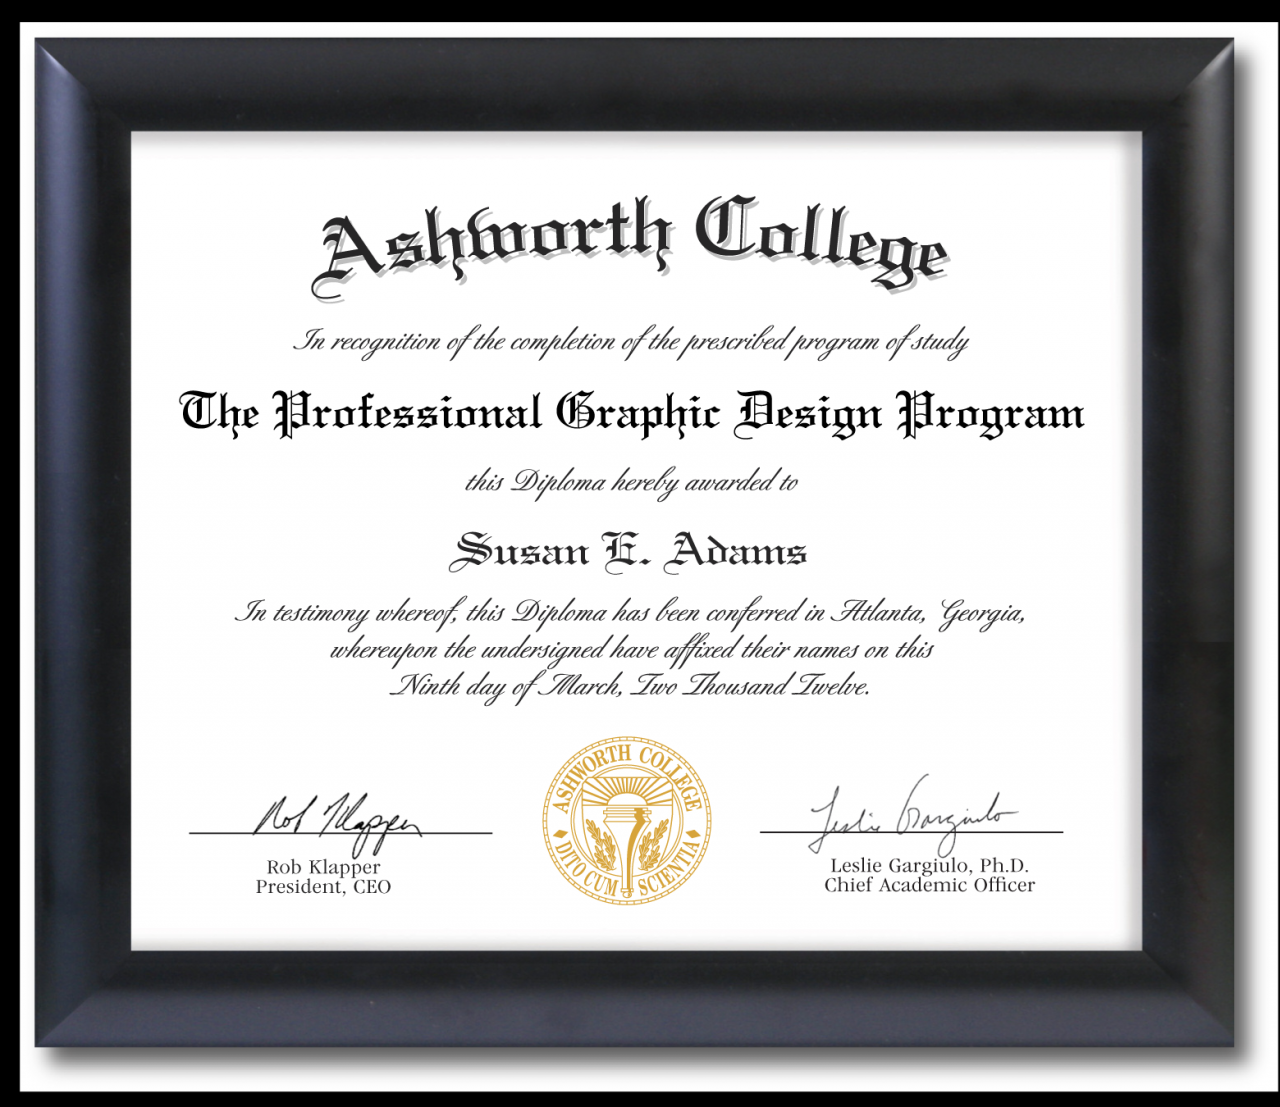 ... school diploma - Ashworth University Online | Colleges & Universities